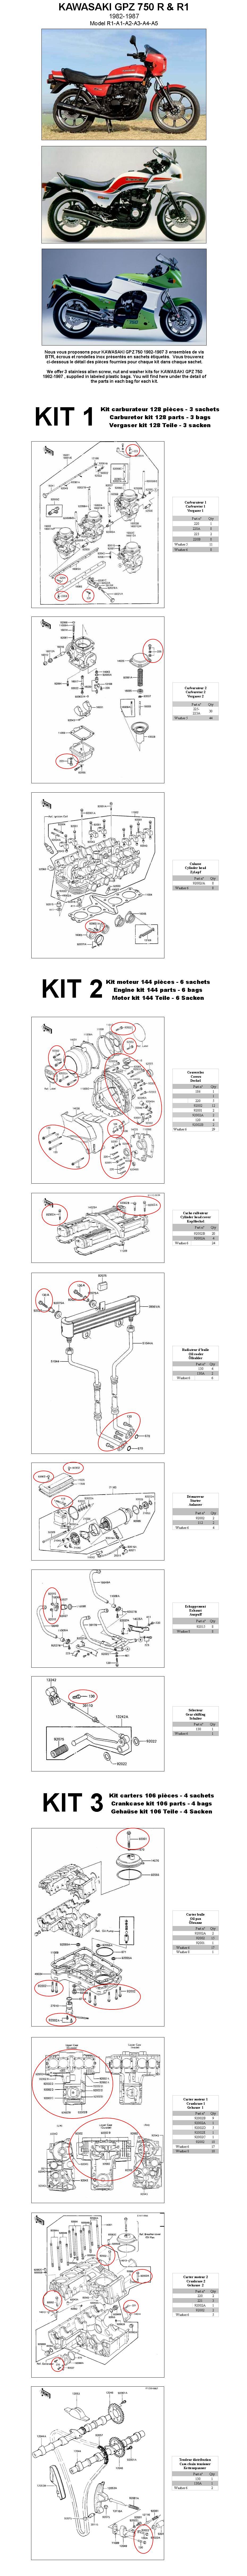 hight resolution of 82 gpz750 wiring diagram